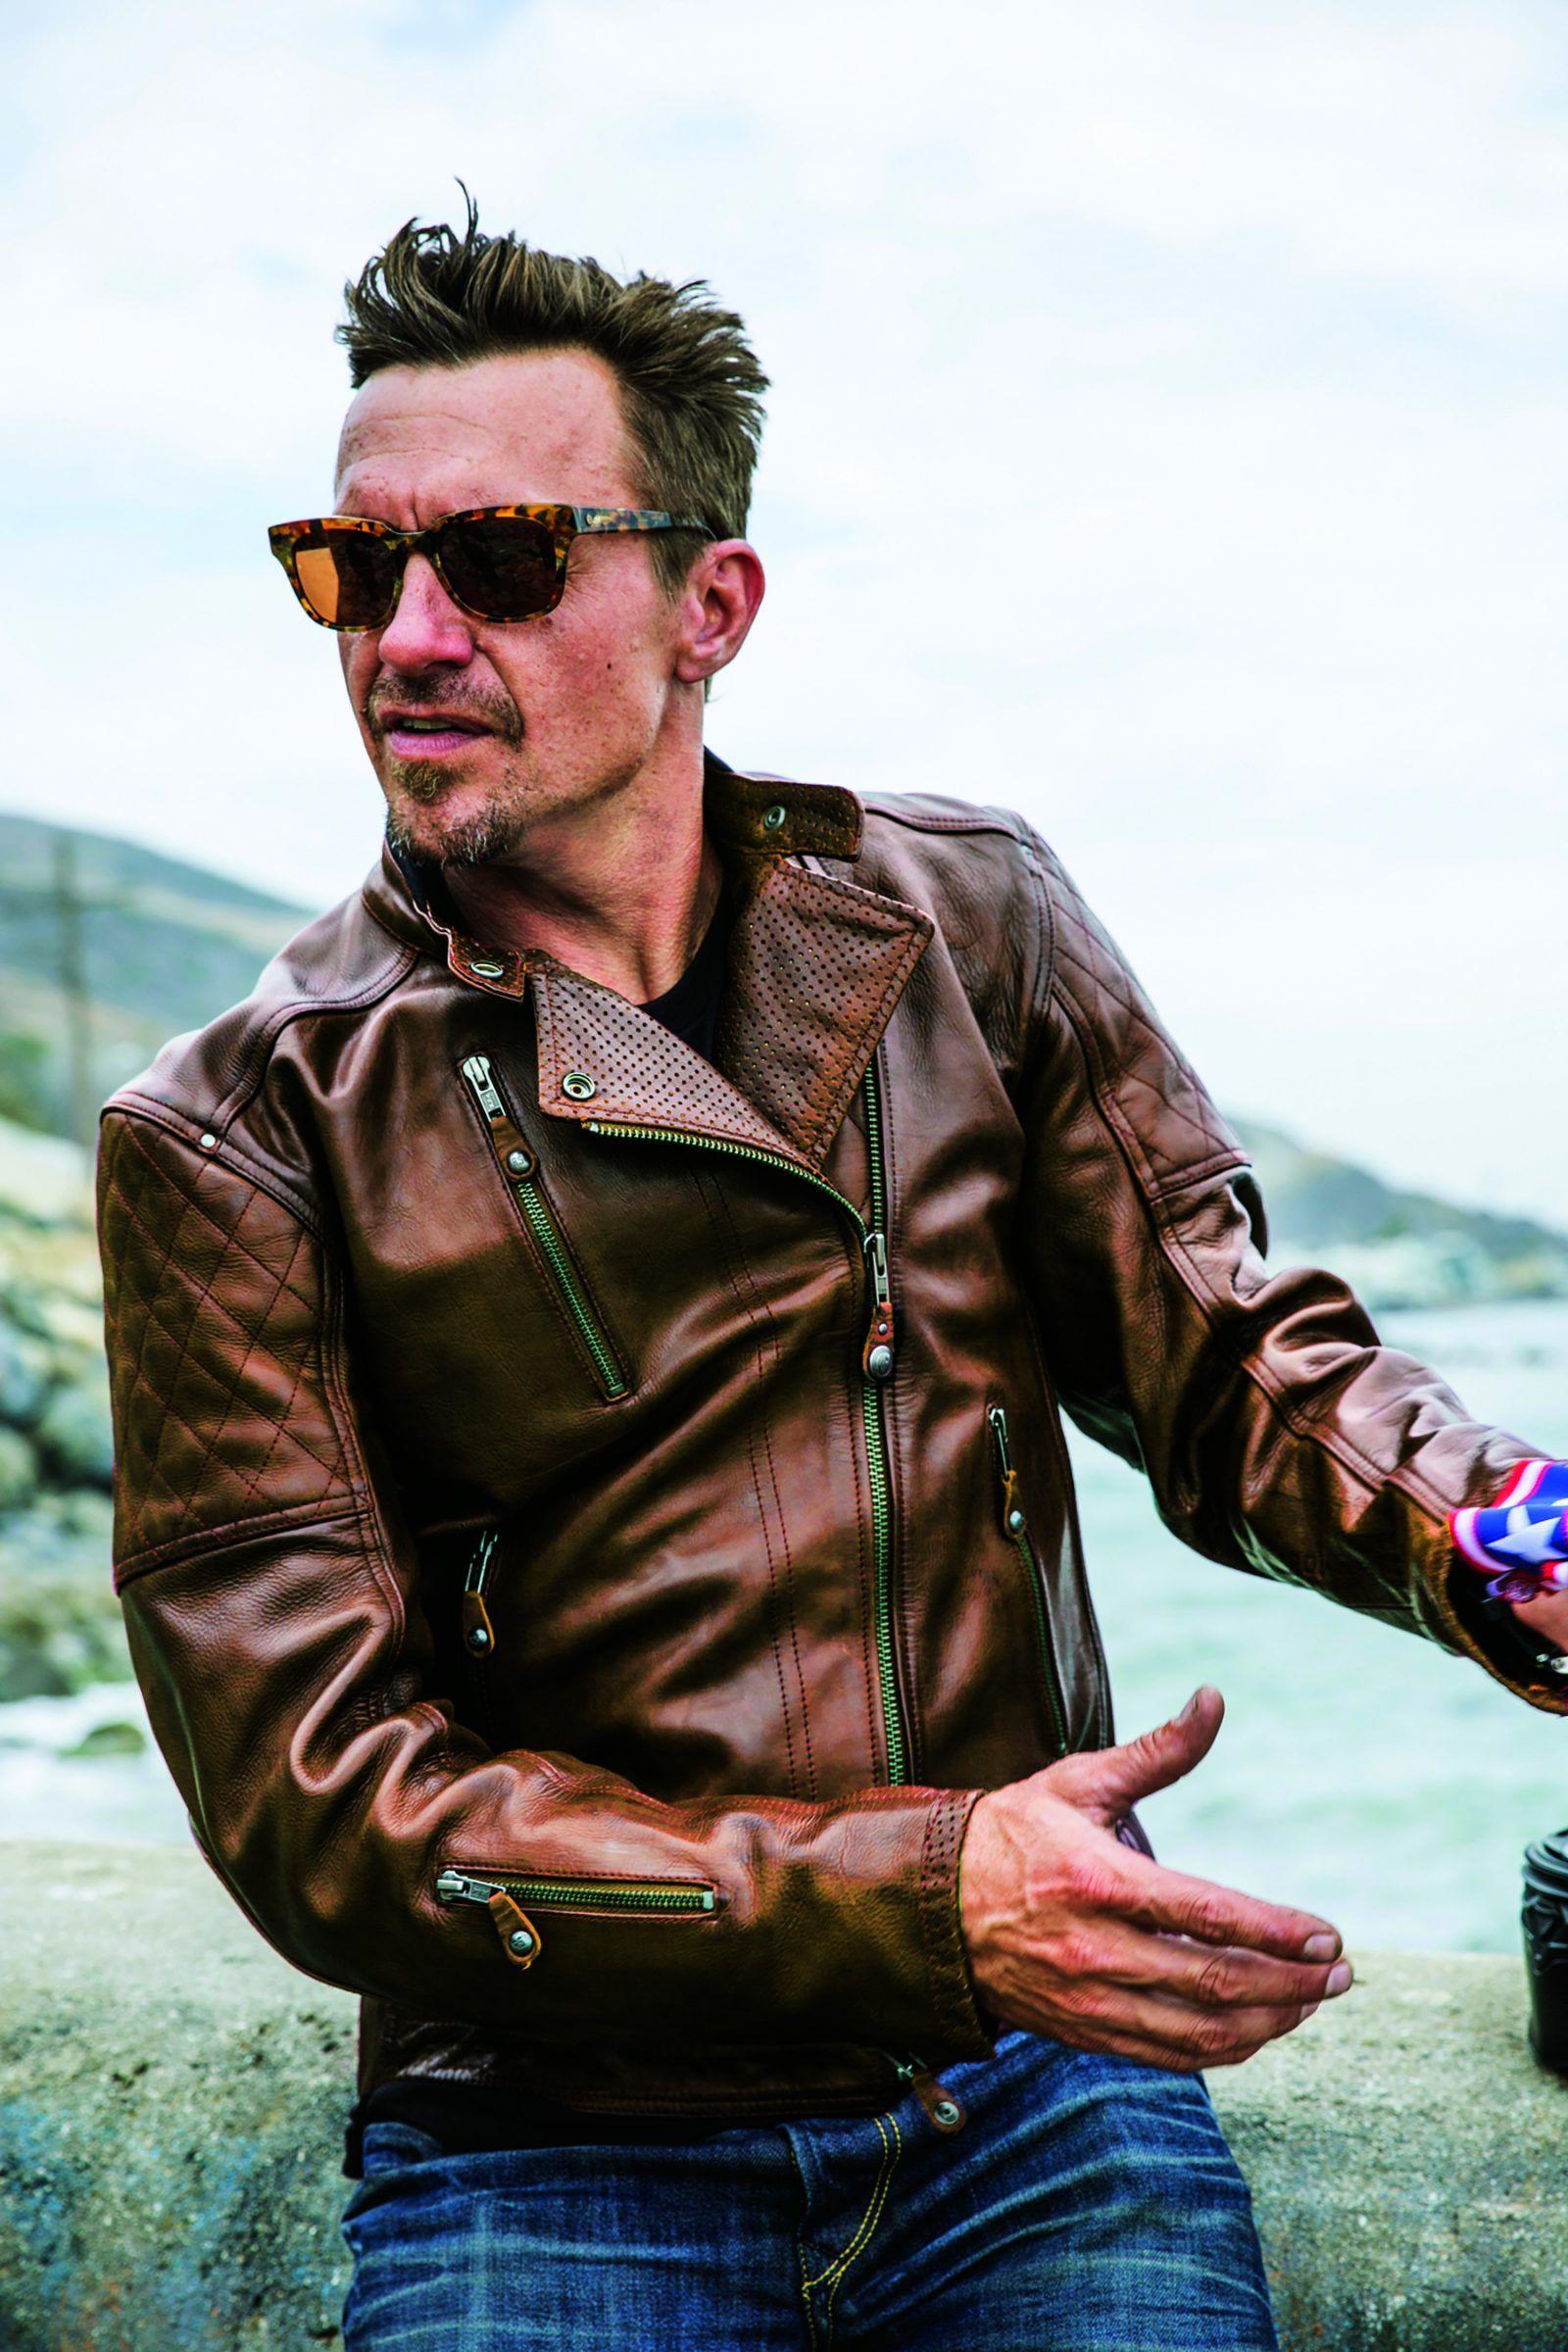 The Roland Sands Design Clash Jacket Roland Sands Design Jackets Leather Jacket Men [ 2400 x 1600 Pixel ]